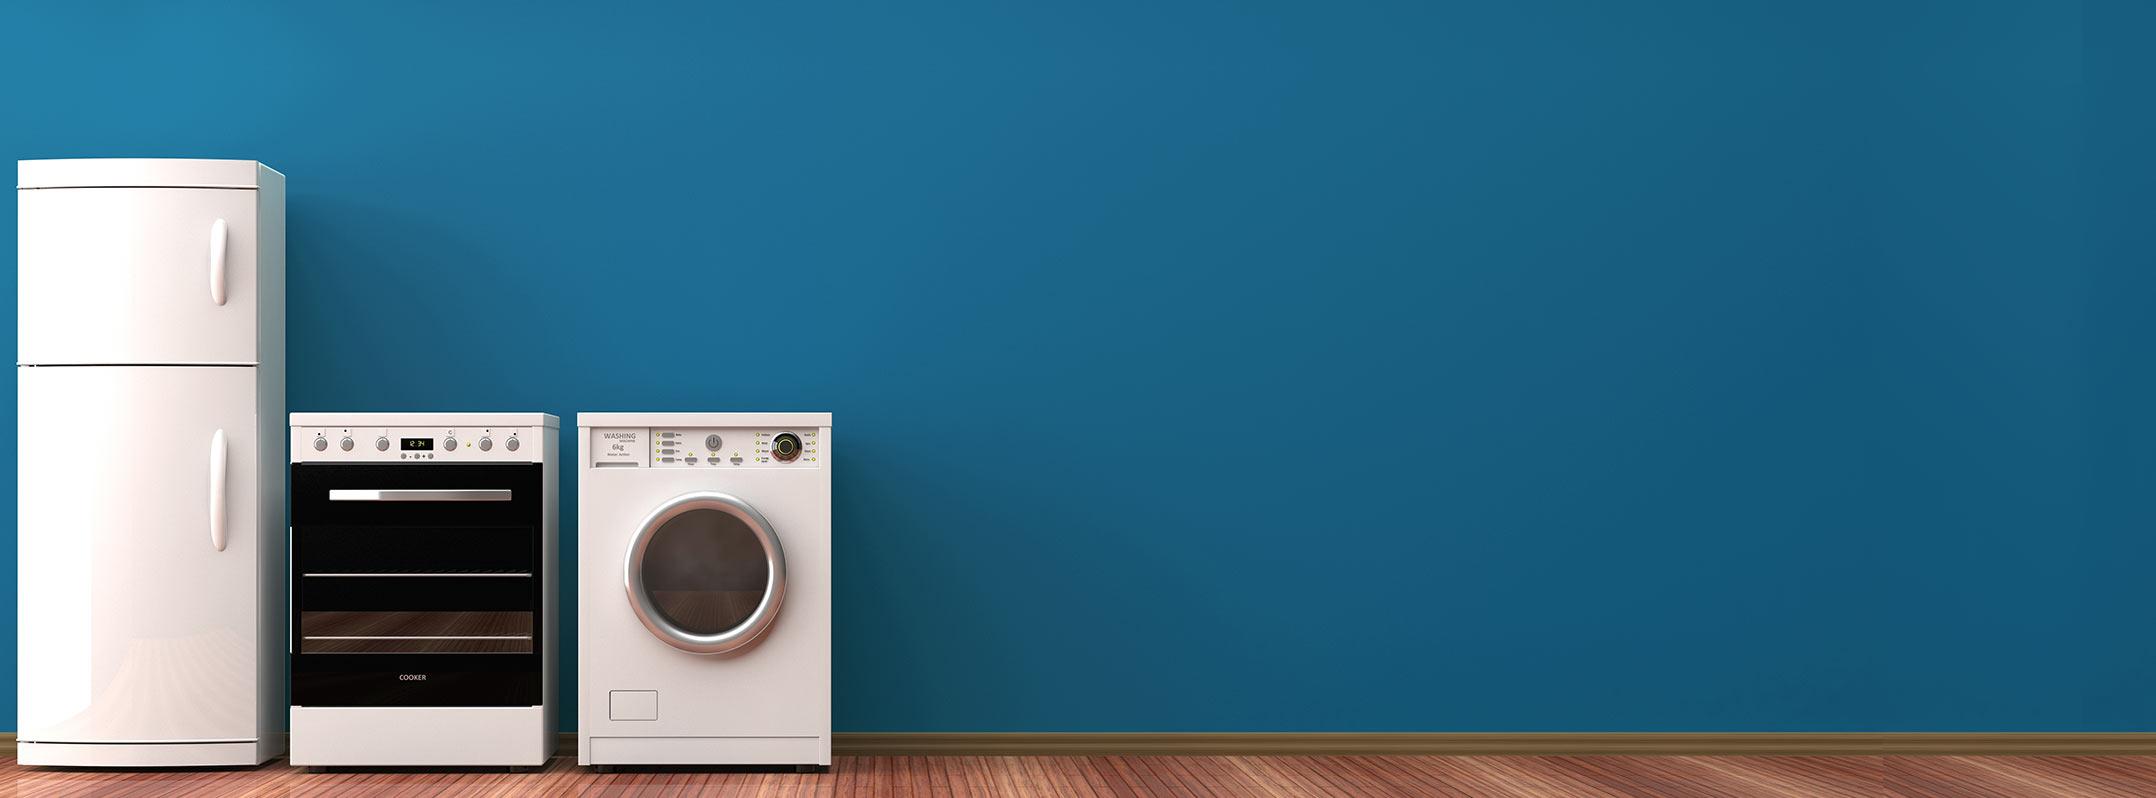 Contact The Best Appliance Repair Company In Atlanta Ga